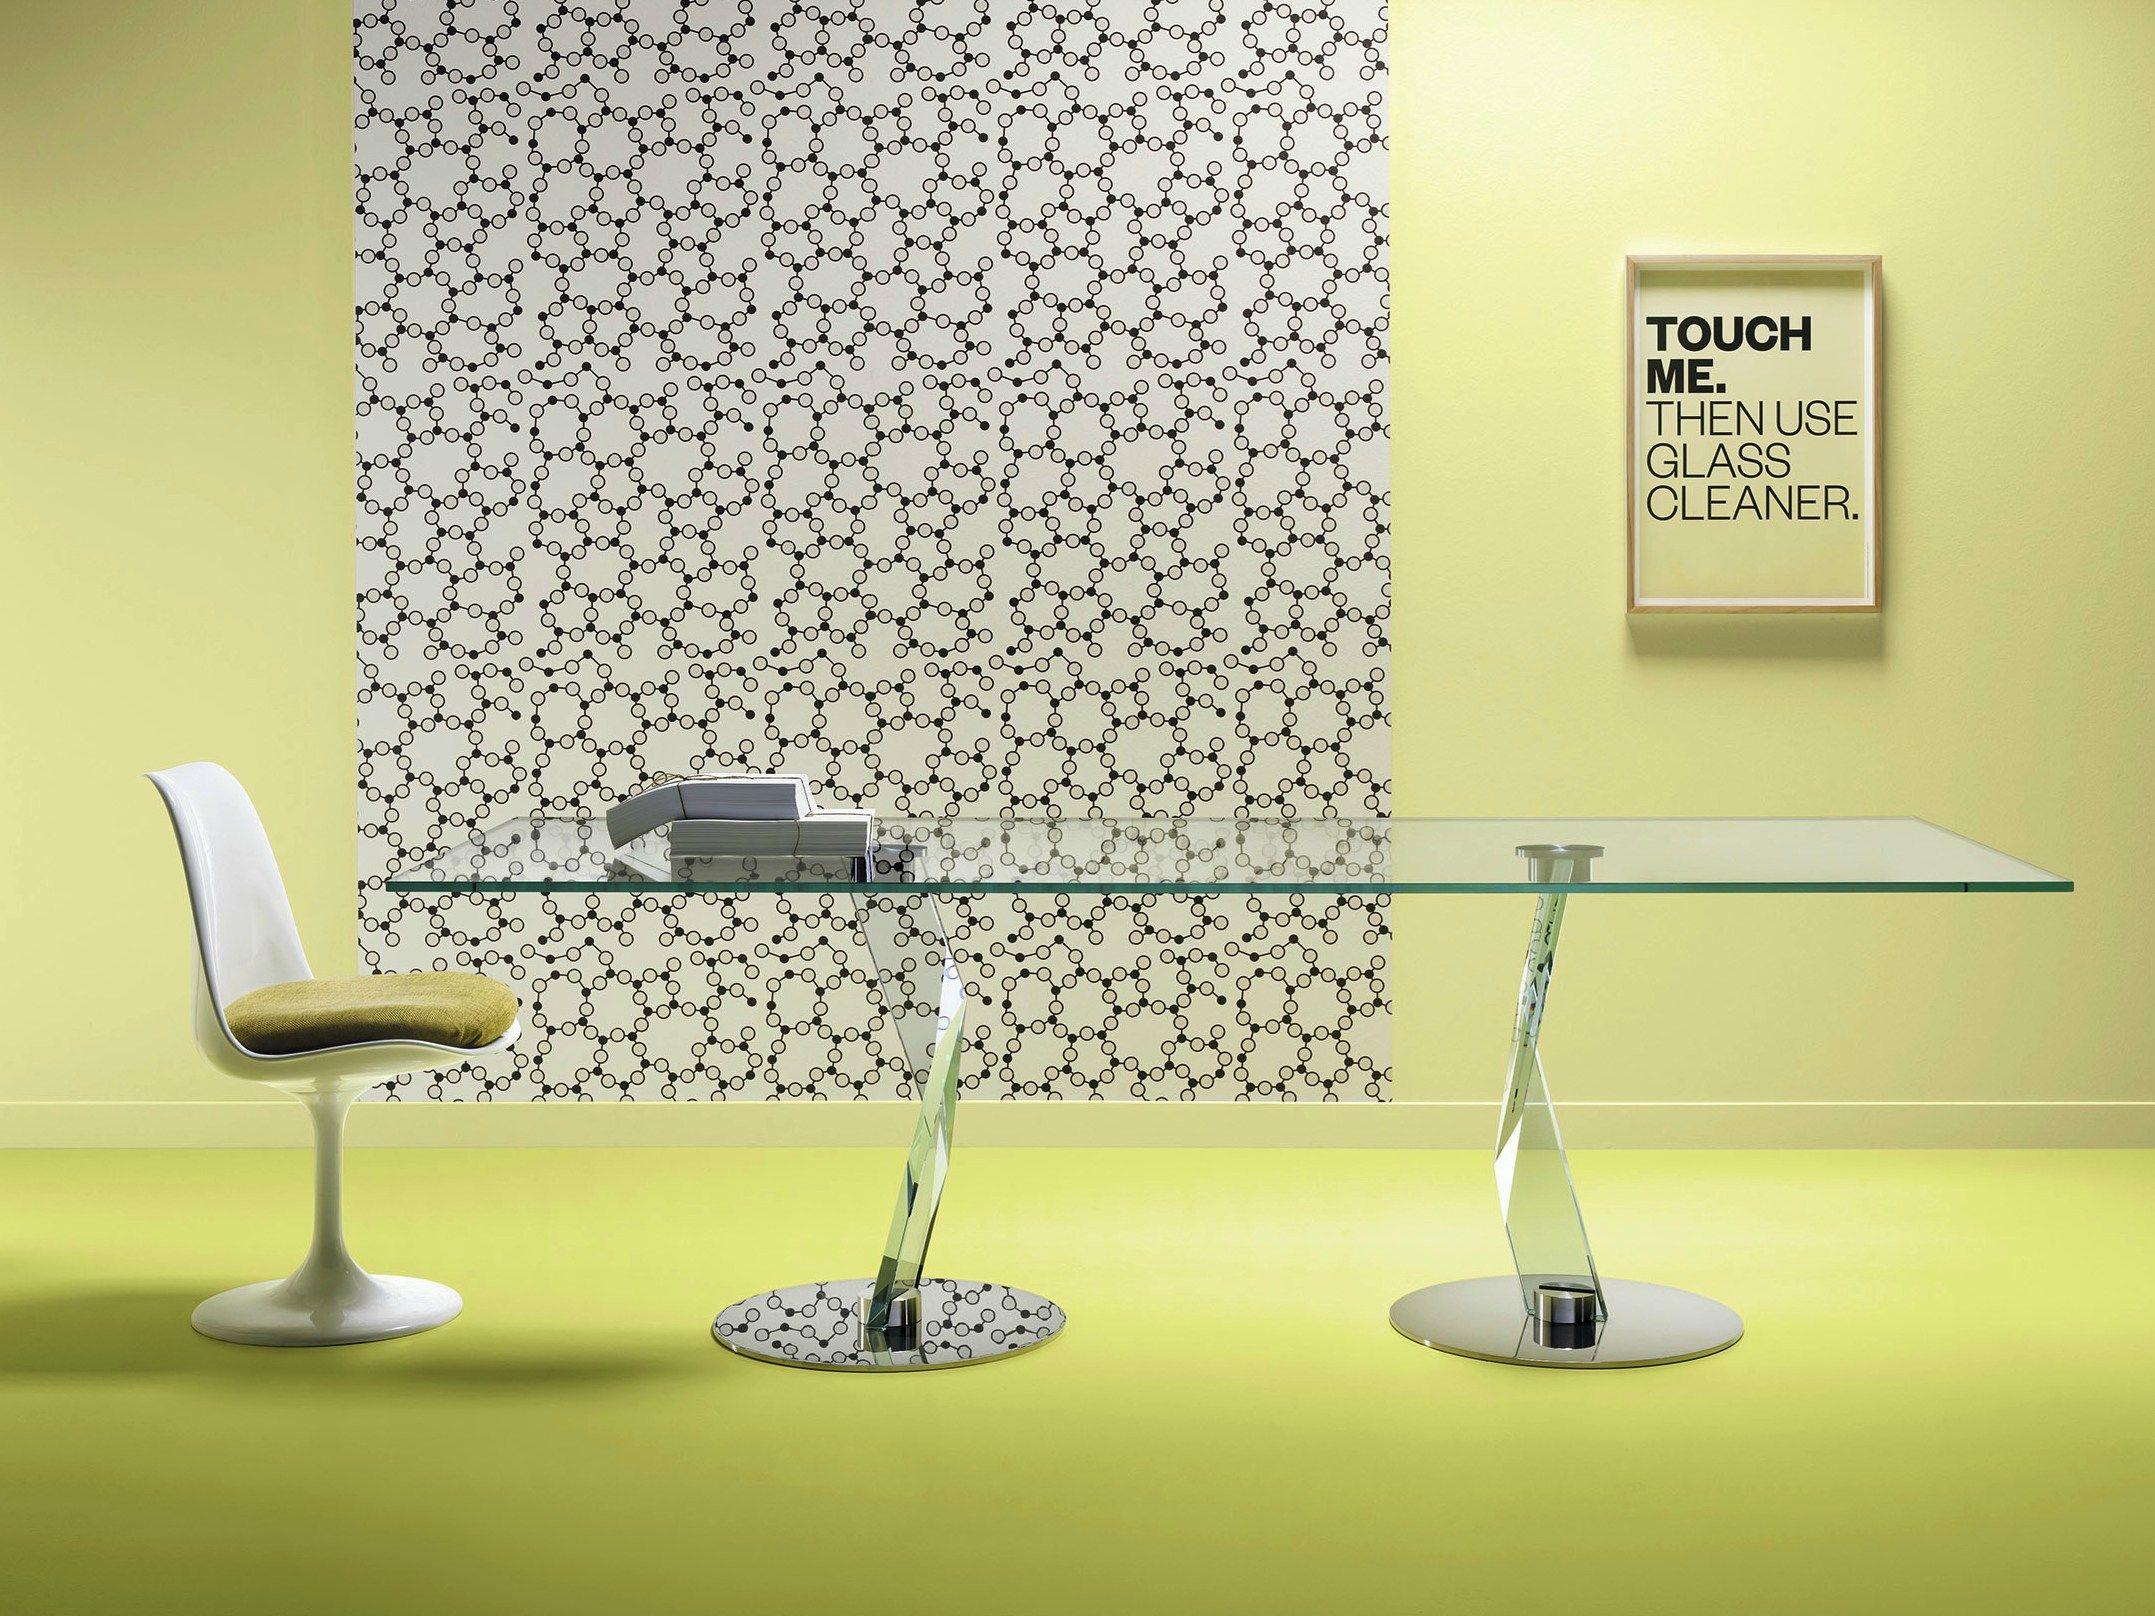 Bakkarat tavolo rettangolare by t d tonelli design design for Tavolo rettangolare